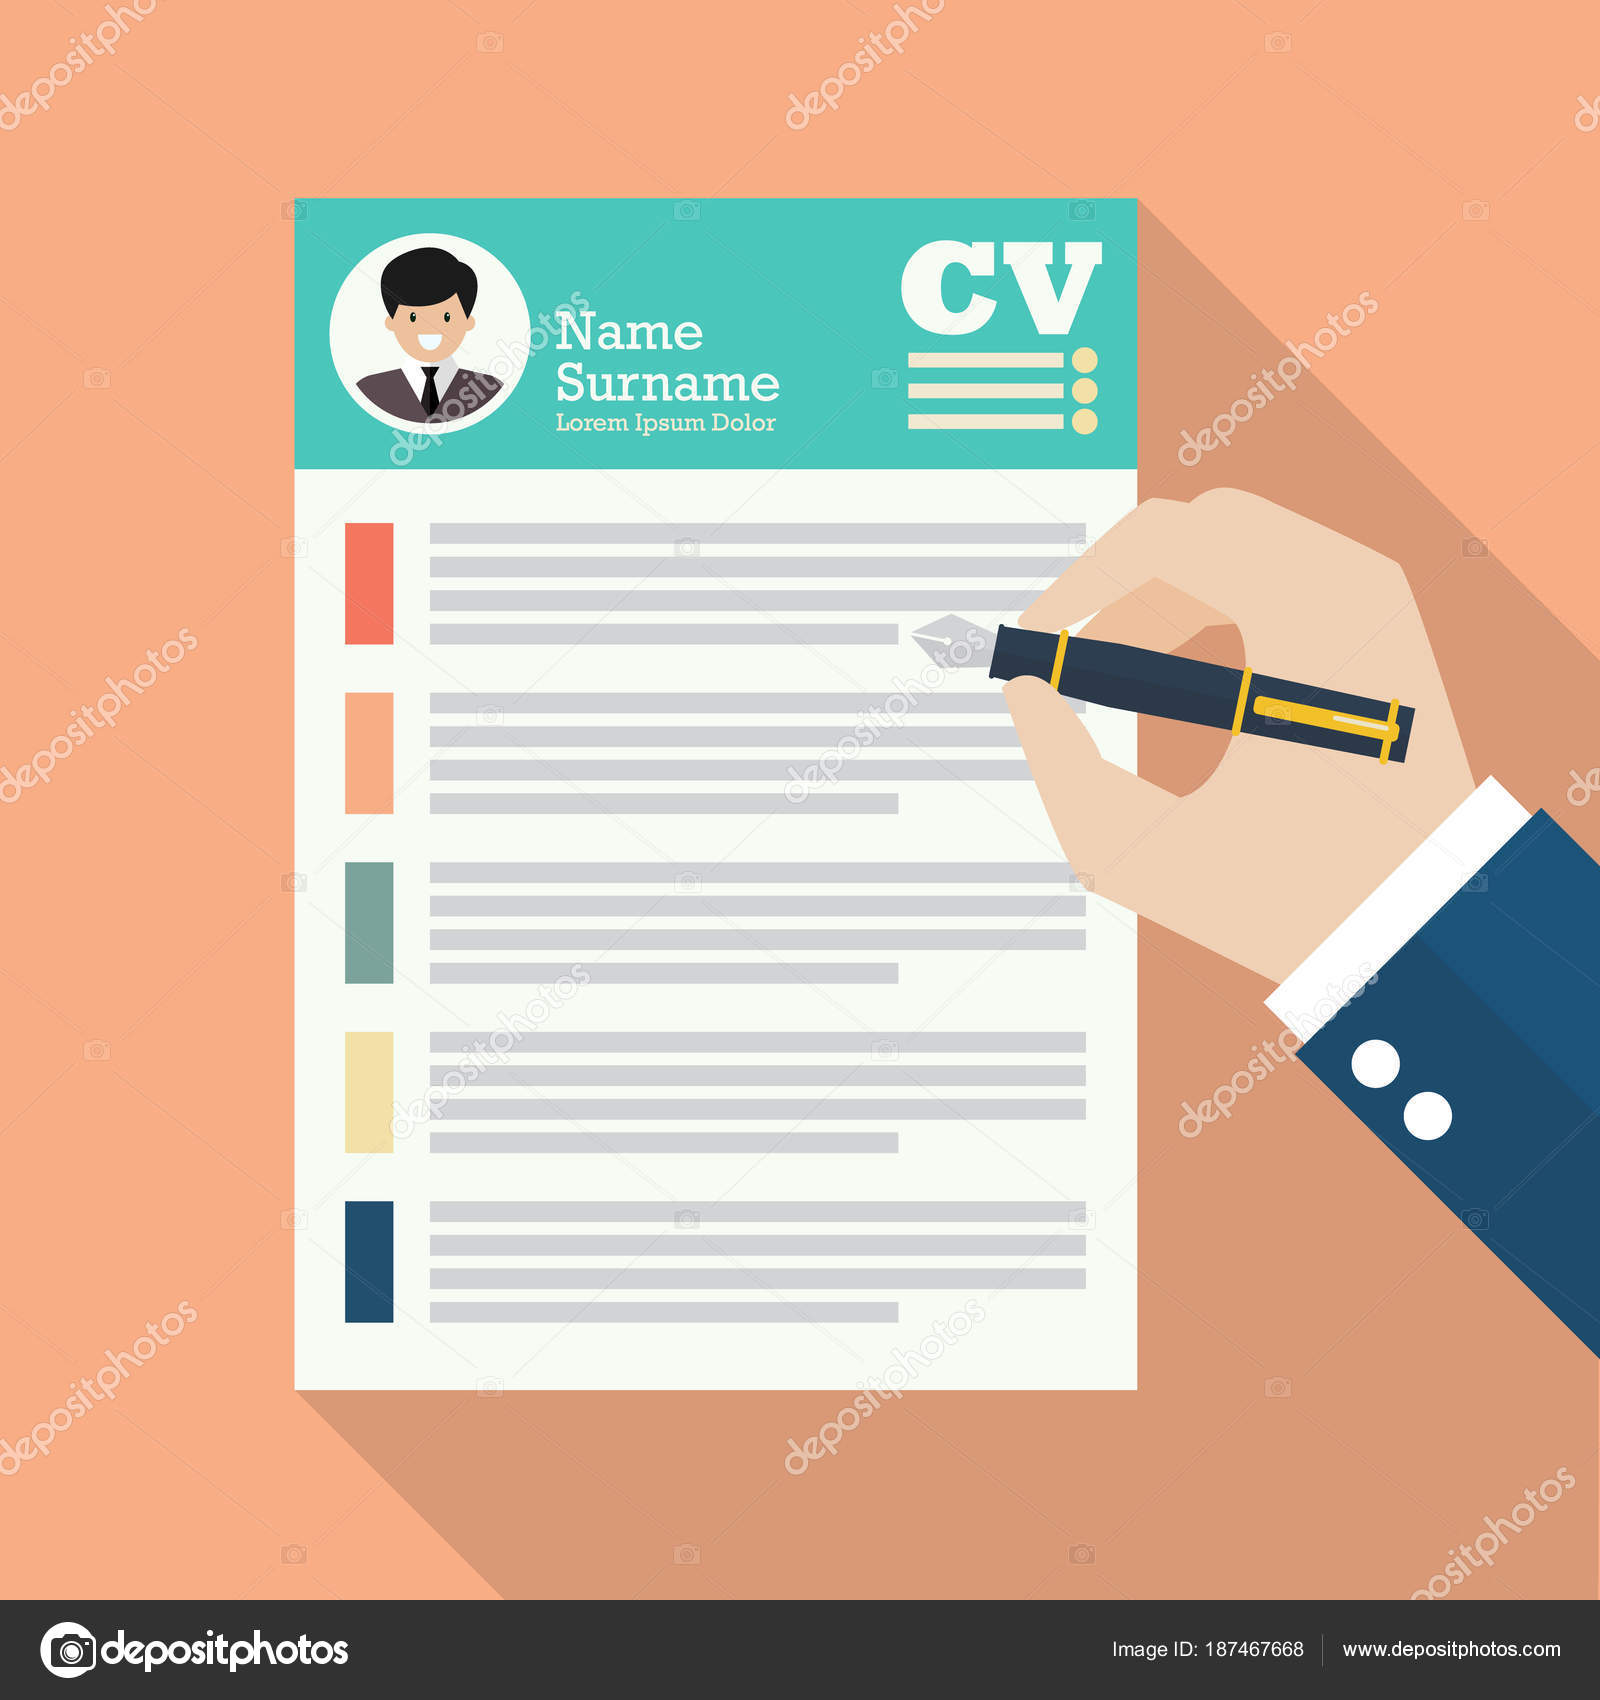 Mano escribir Curriculum Vitae hoja de papel de aplicación — Archivo ...